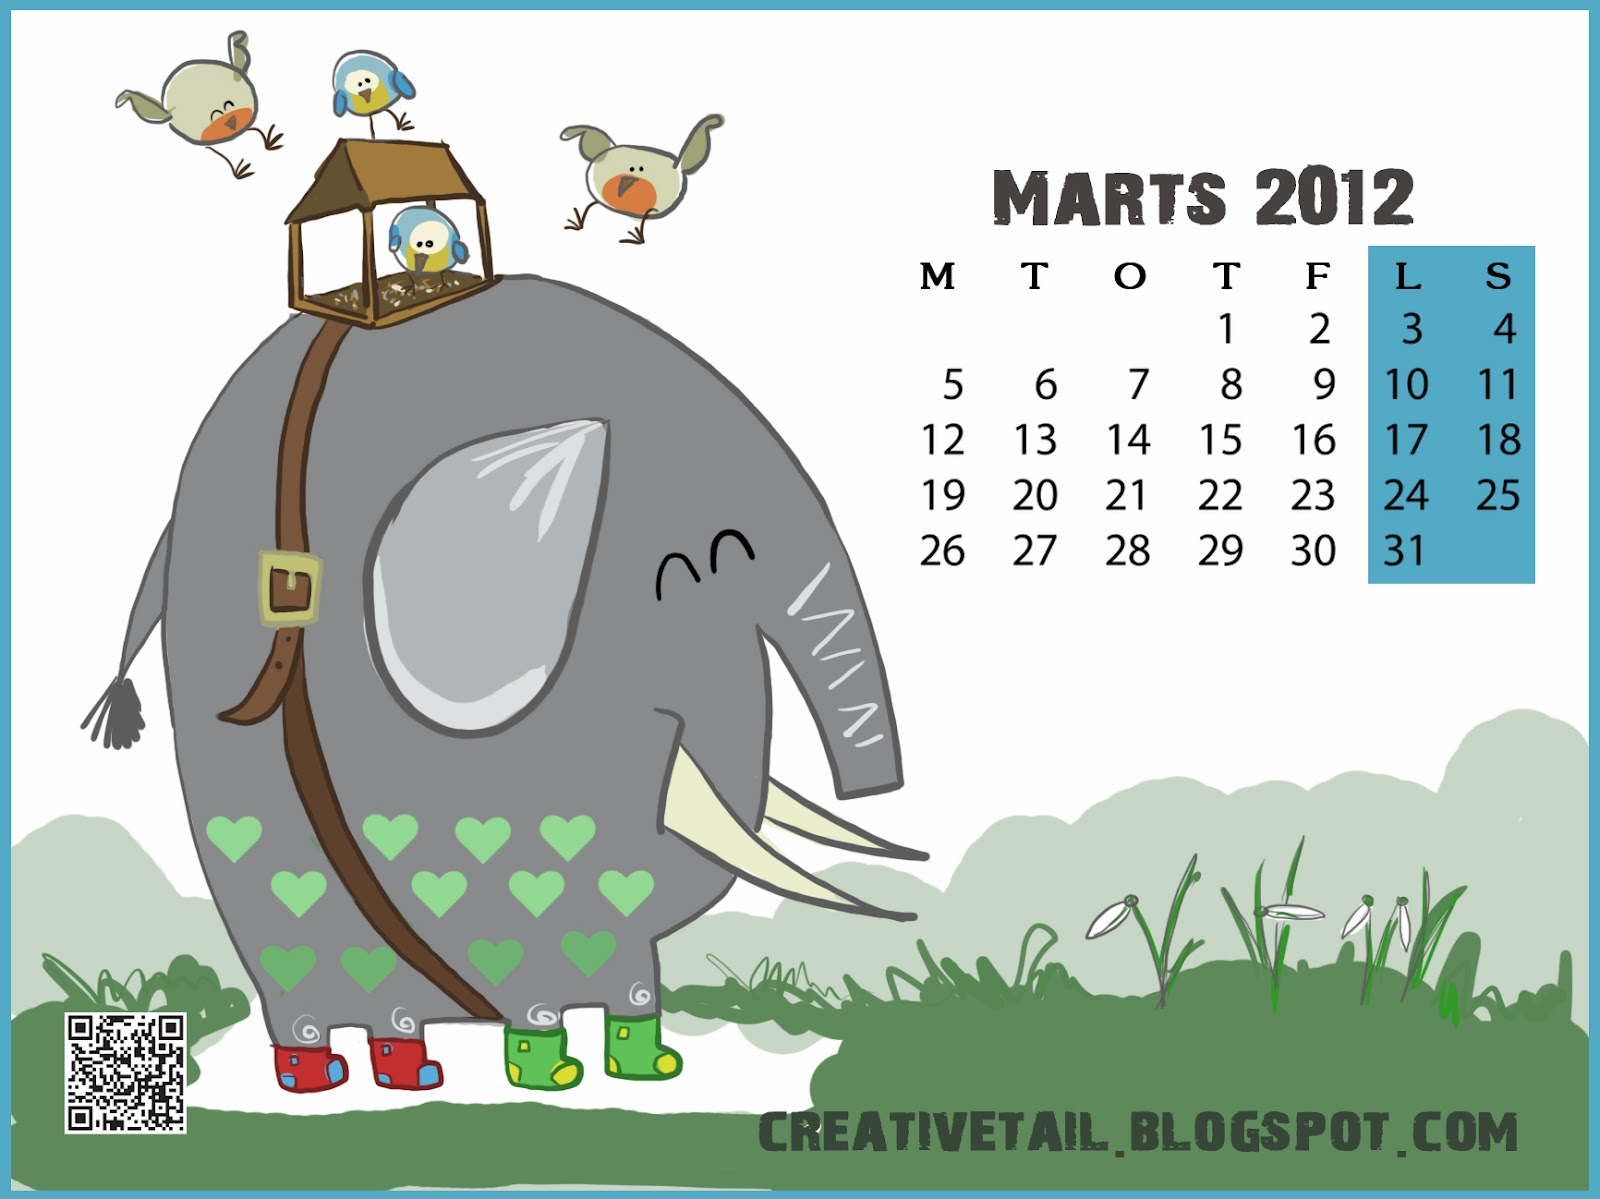 http://2.bp.blogspot.com/-mojw56vmz2E/T0oPGnPSxKI/AAAAAAAADrc/TJ_drOzGJtk/s1600/Marts+2012.jpg